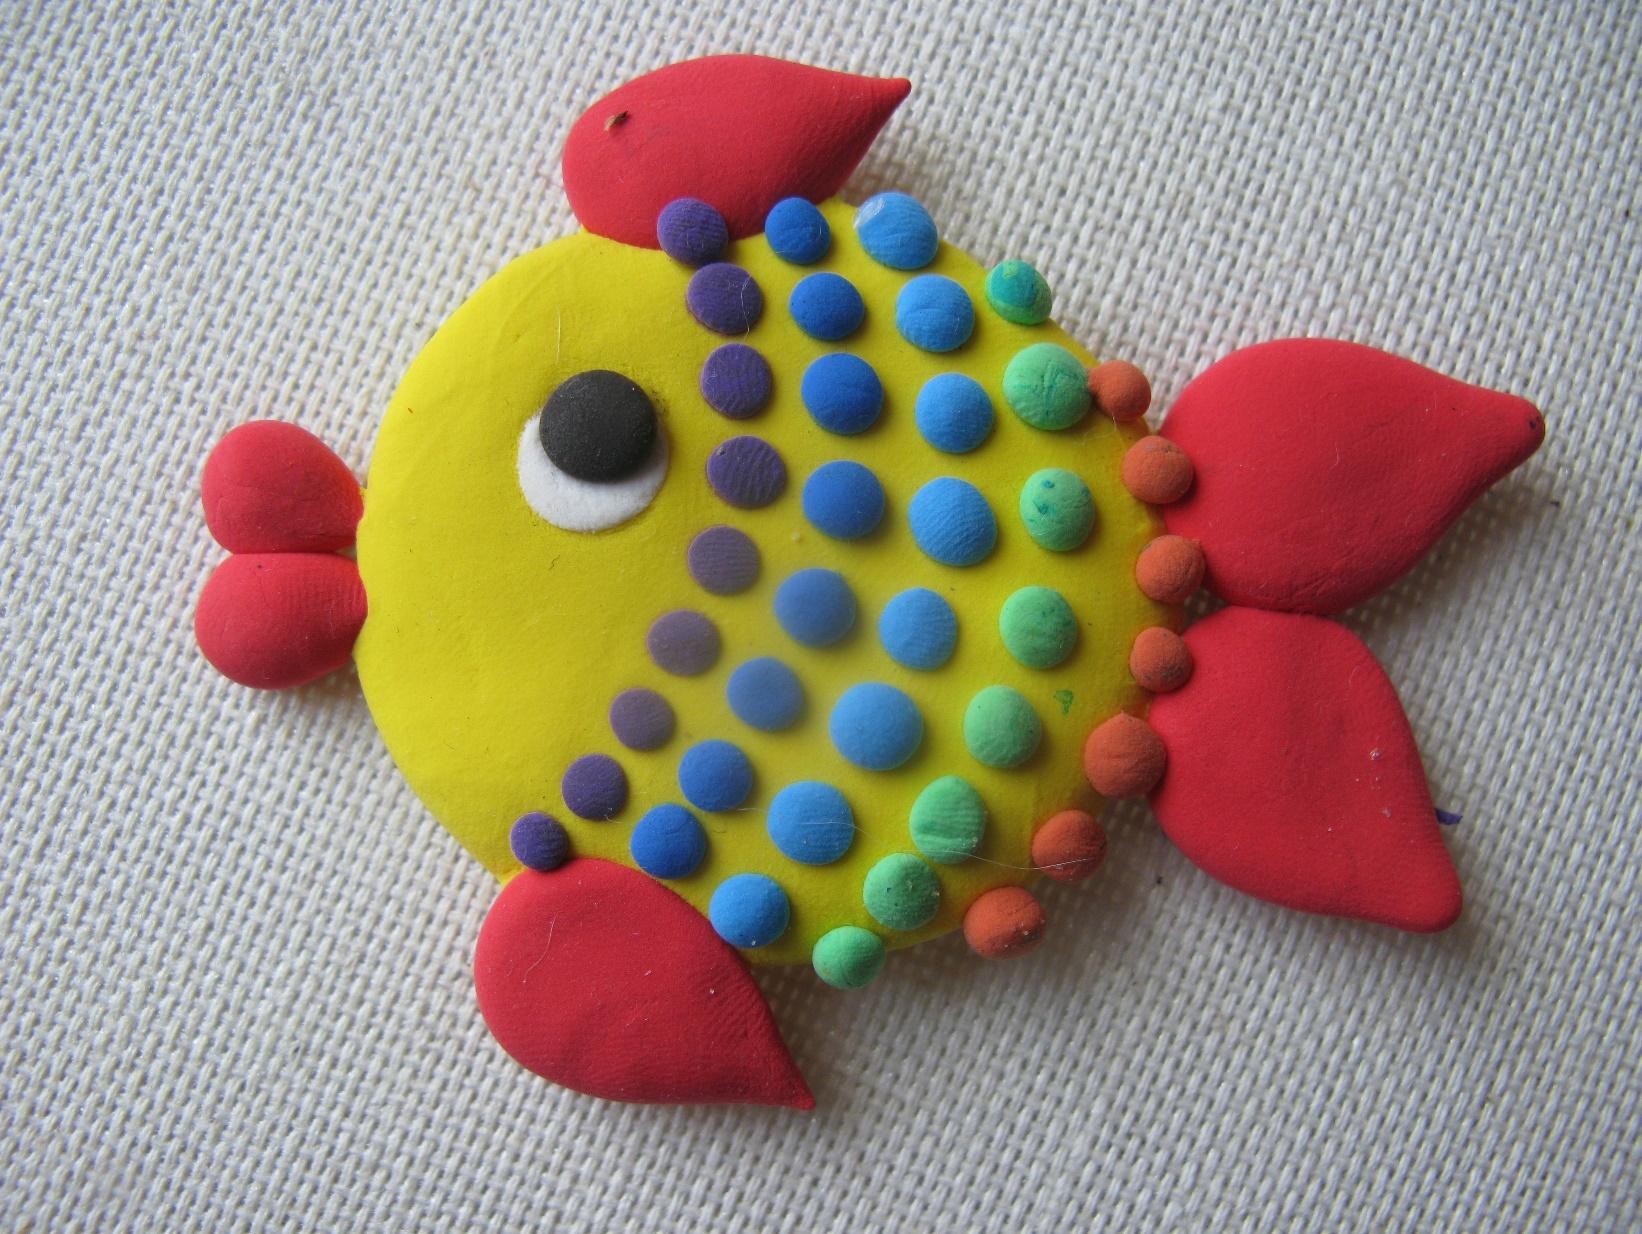 Рыбка из пластилина пошагово фото